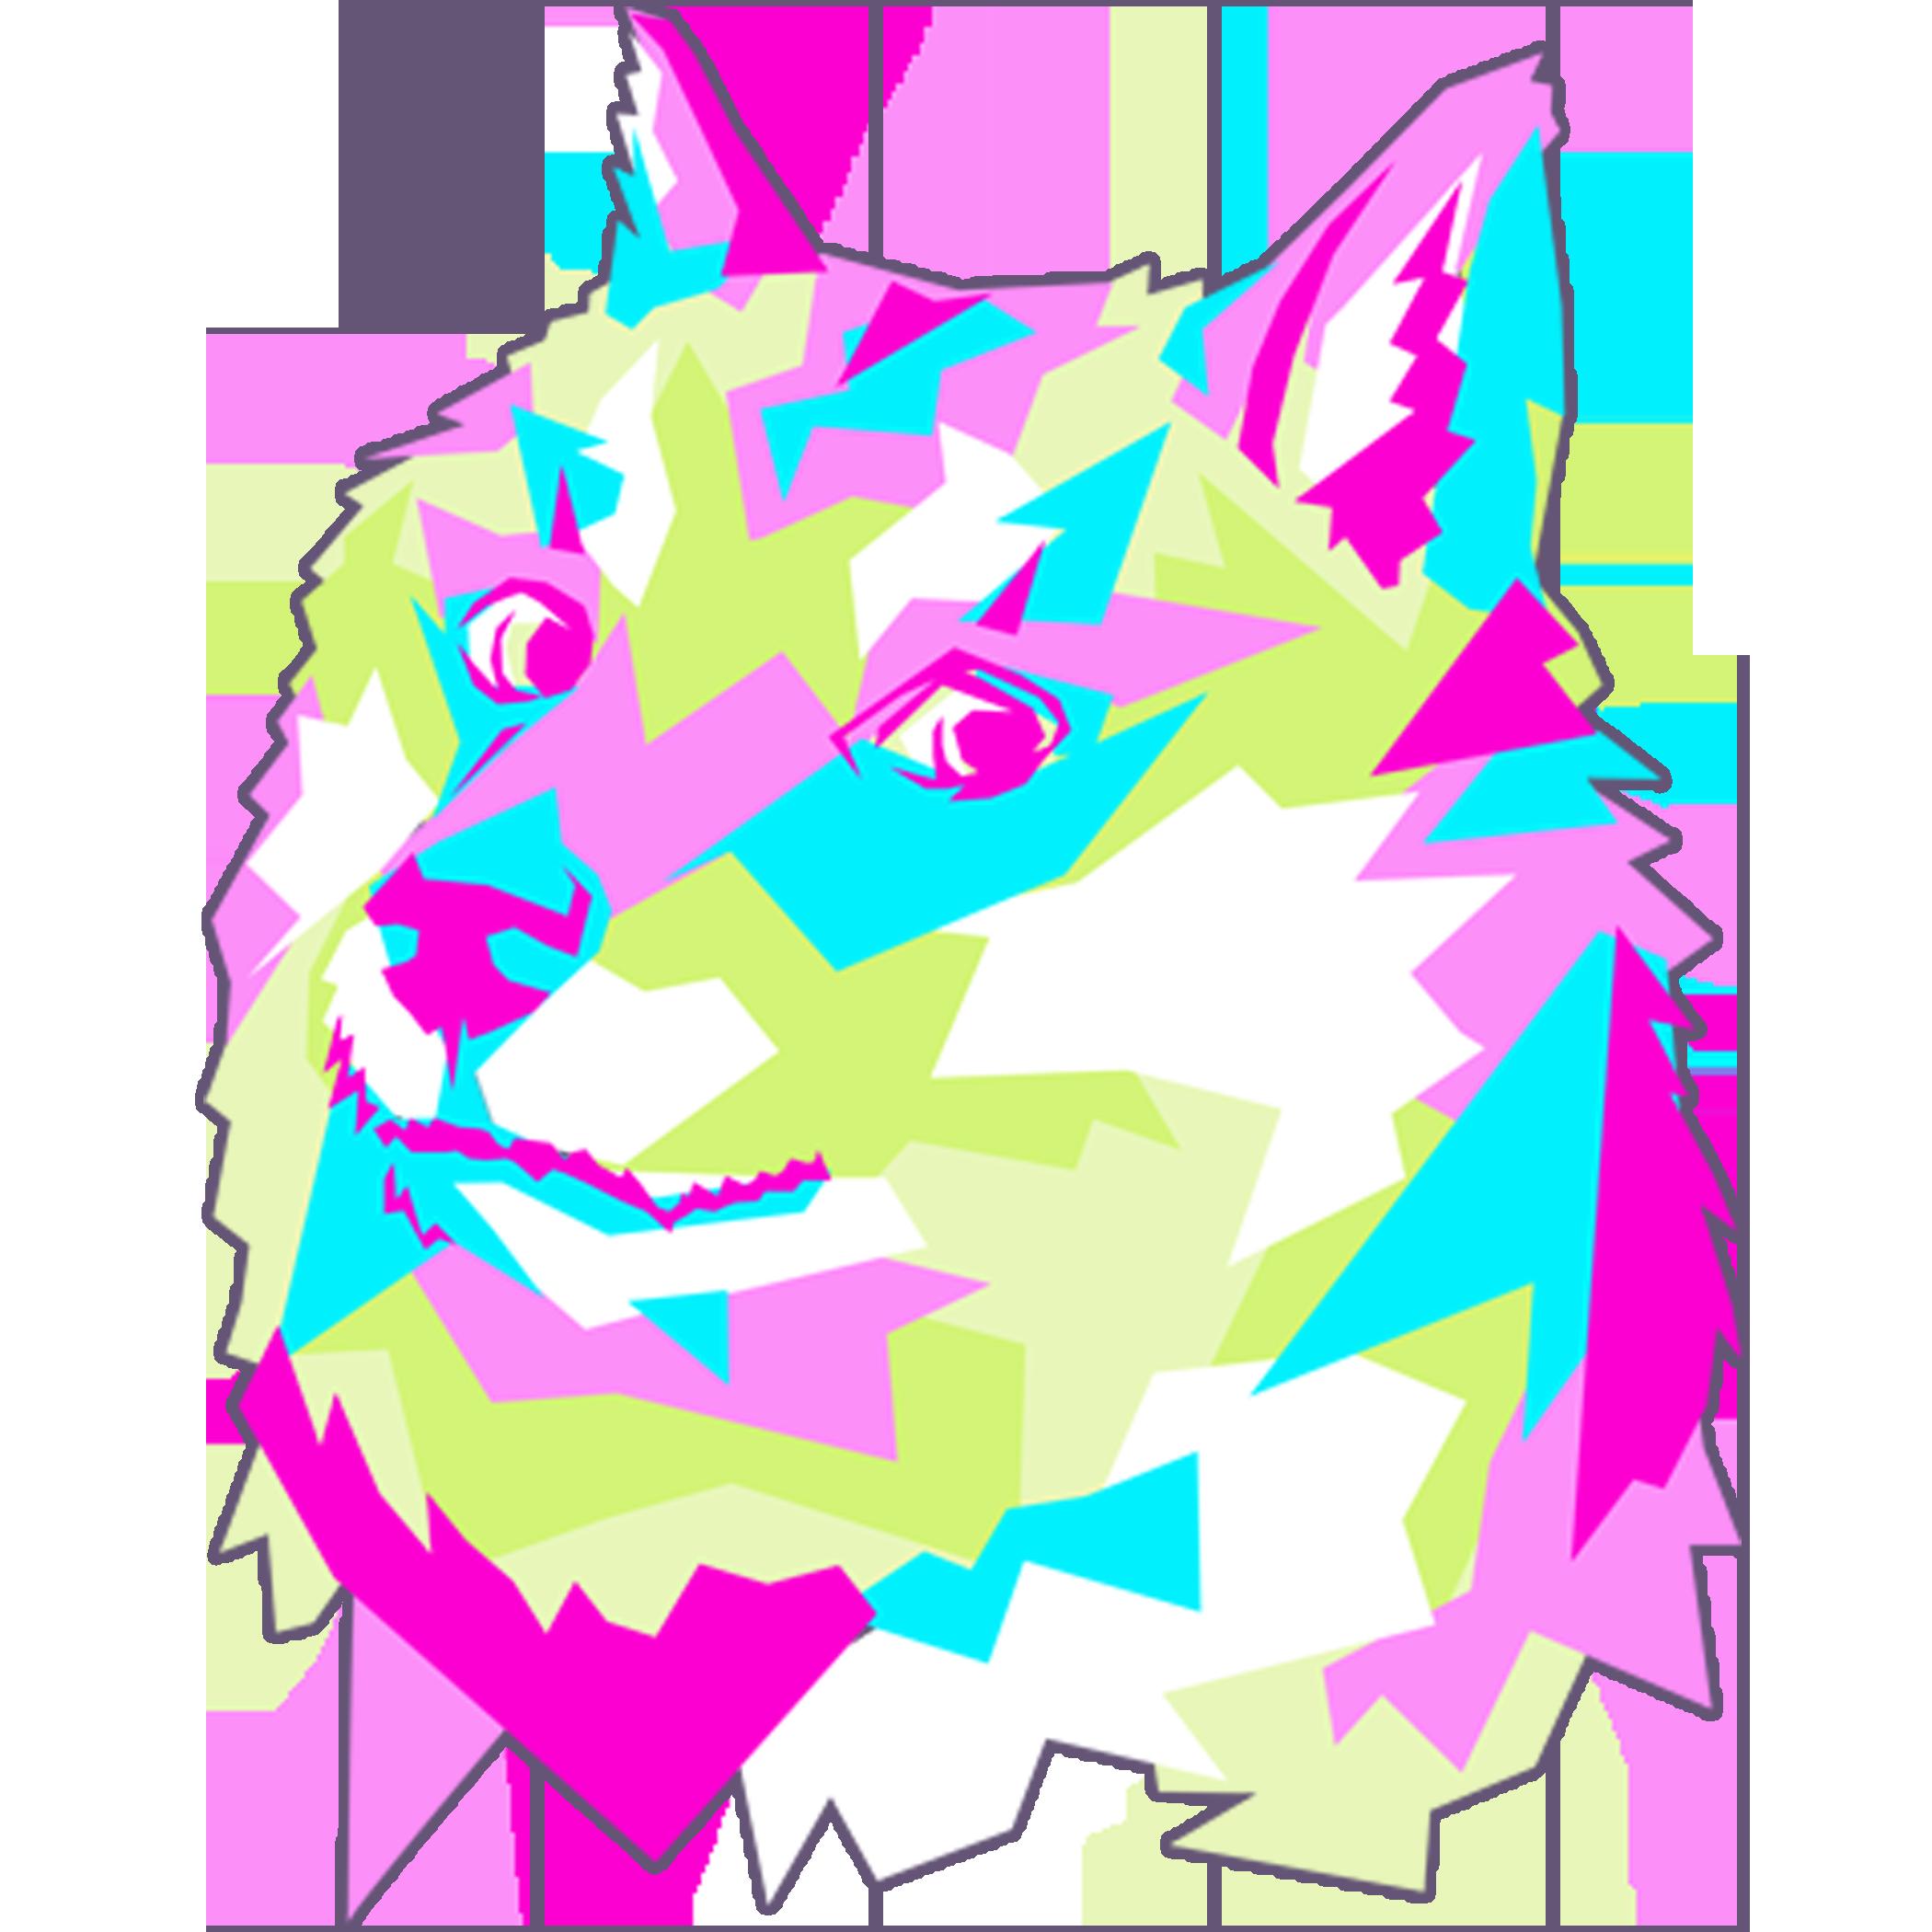 dogehypercolour.png